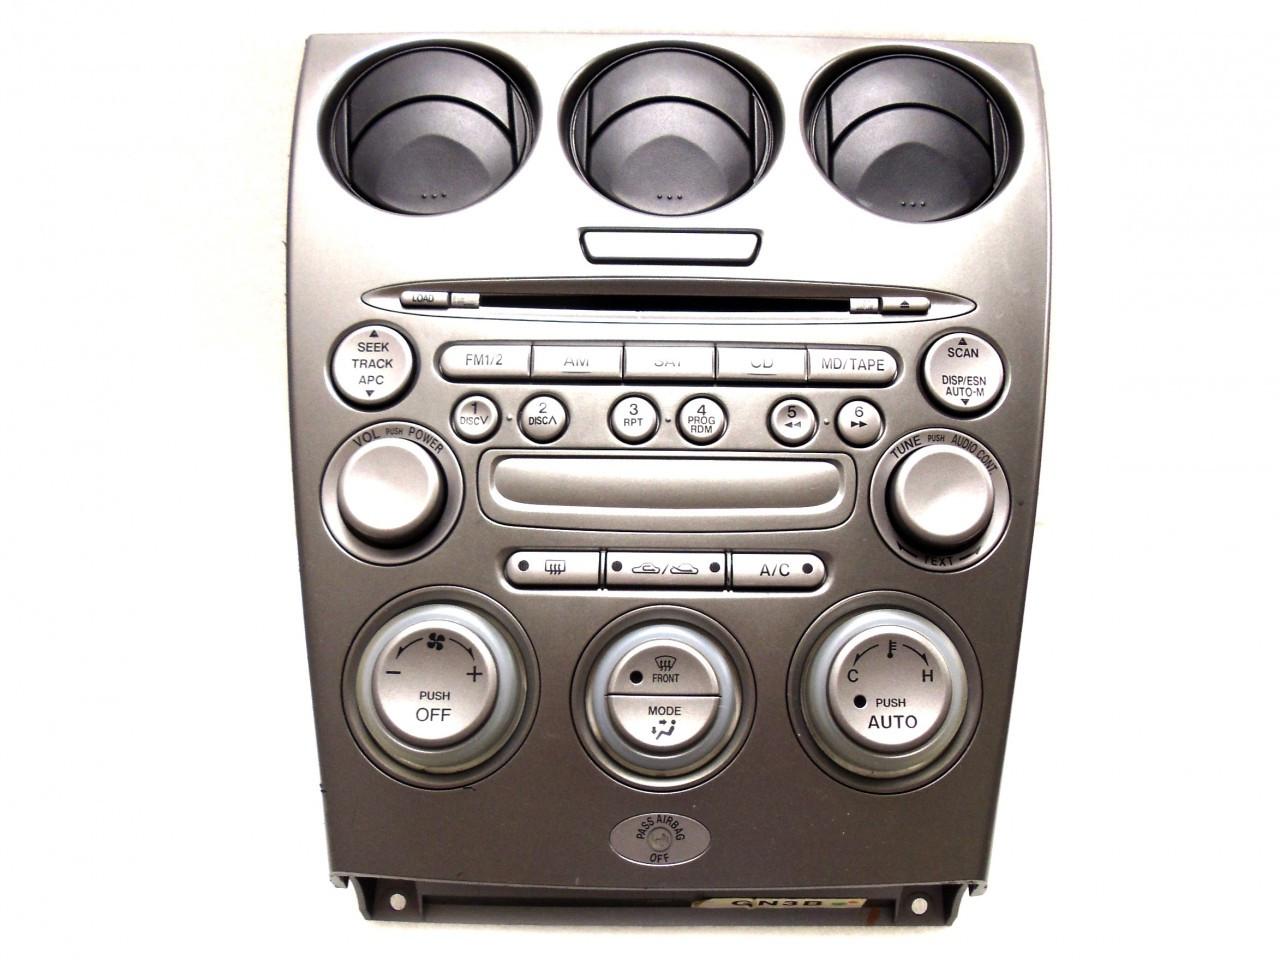 03 04 05 mazda 6 radio stereo 6 disc changer climate controls. Black Bedroom Furniture Sets. Home Design Ideas